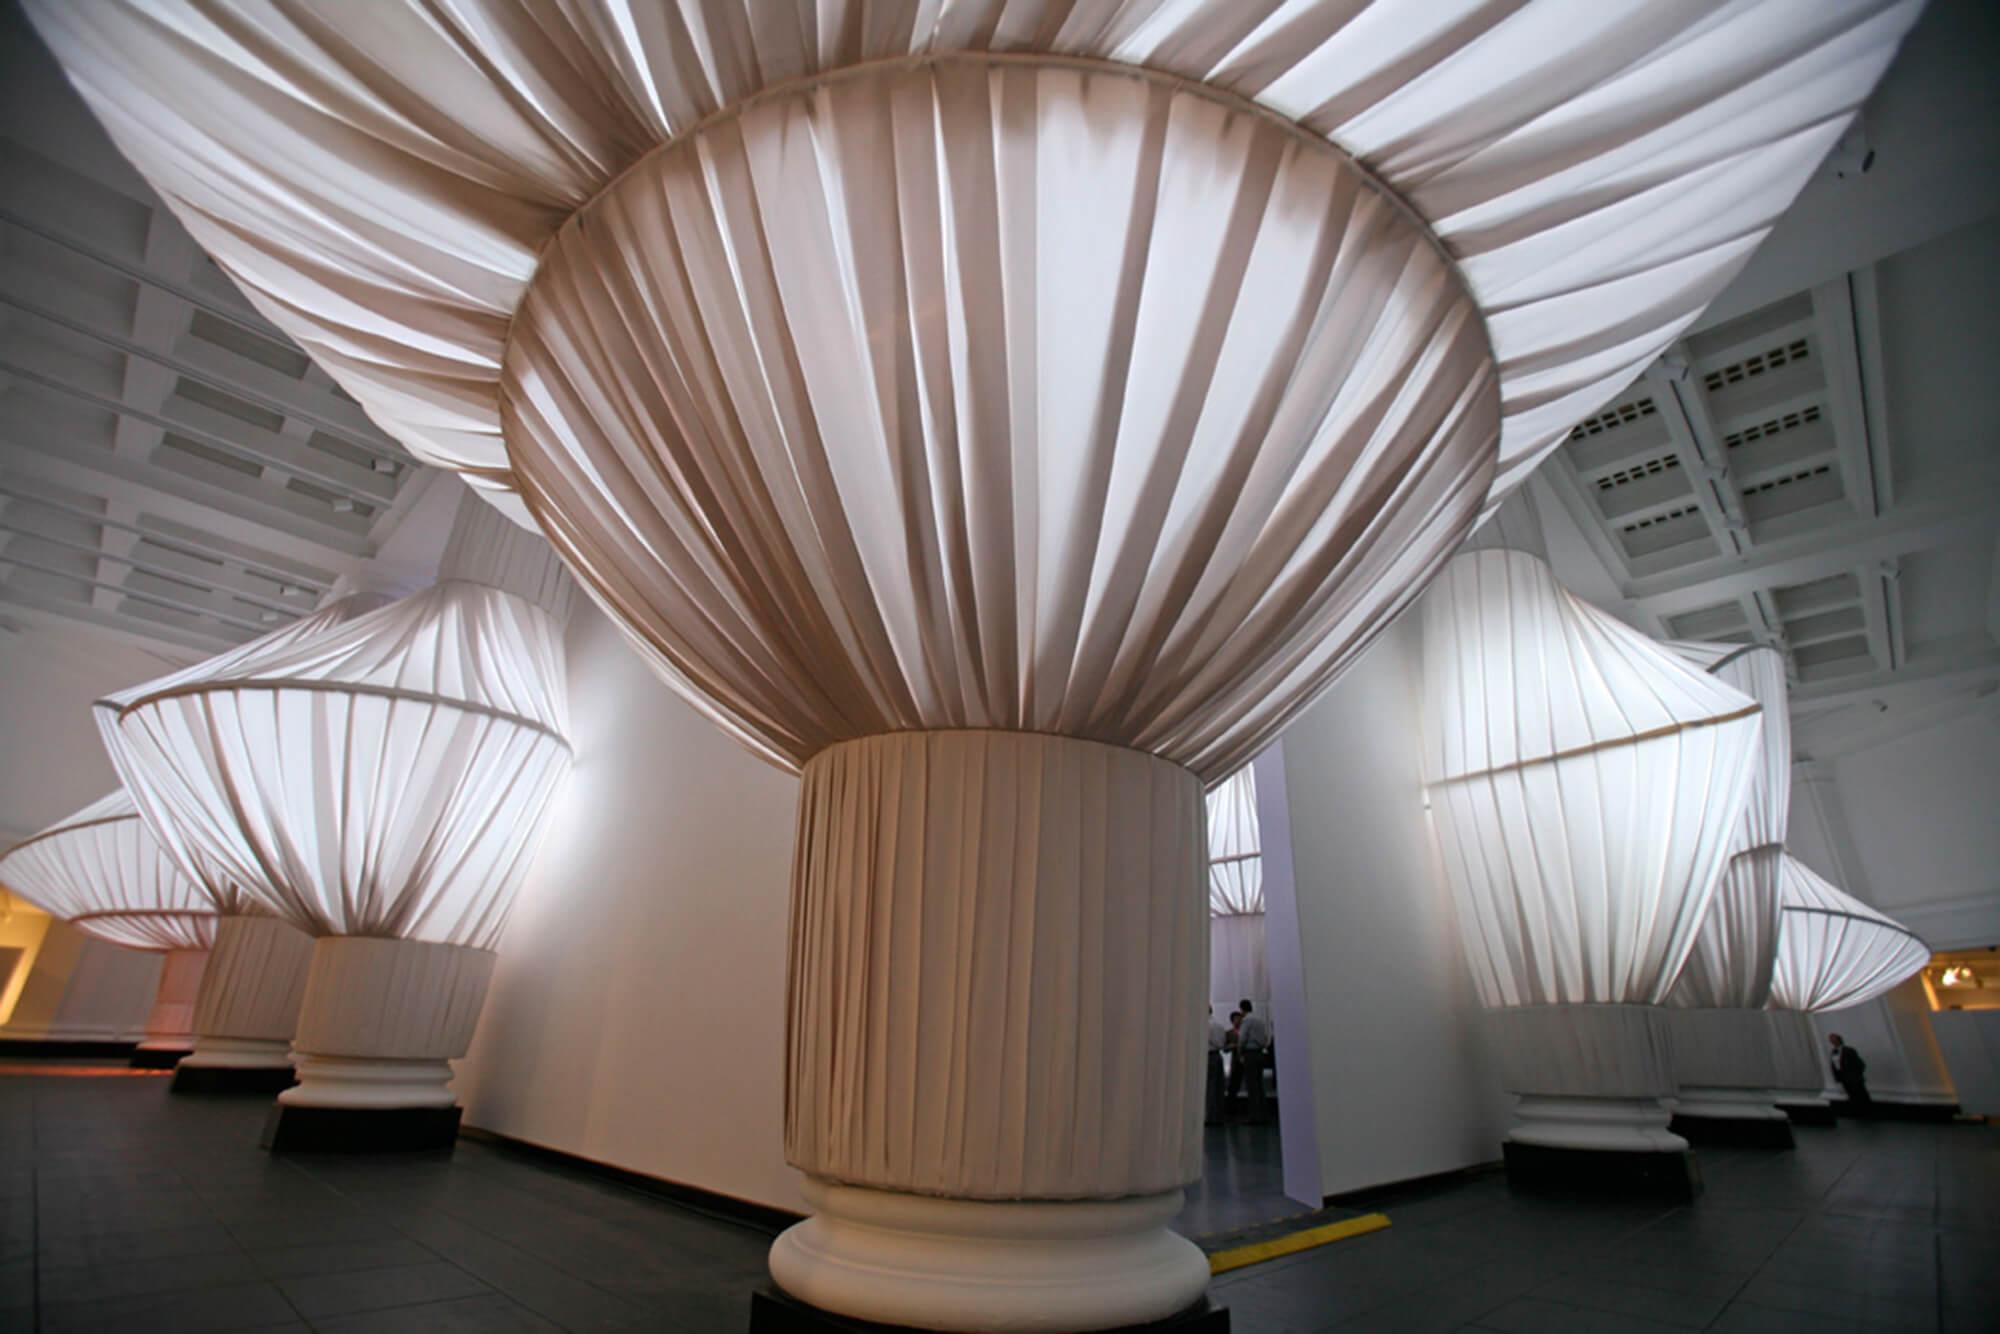 reOrder 展览中的一个立柱采用了 Sunbrella 自然帆布织物